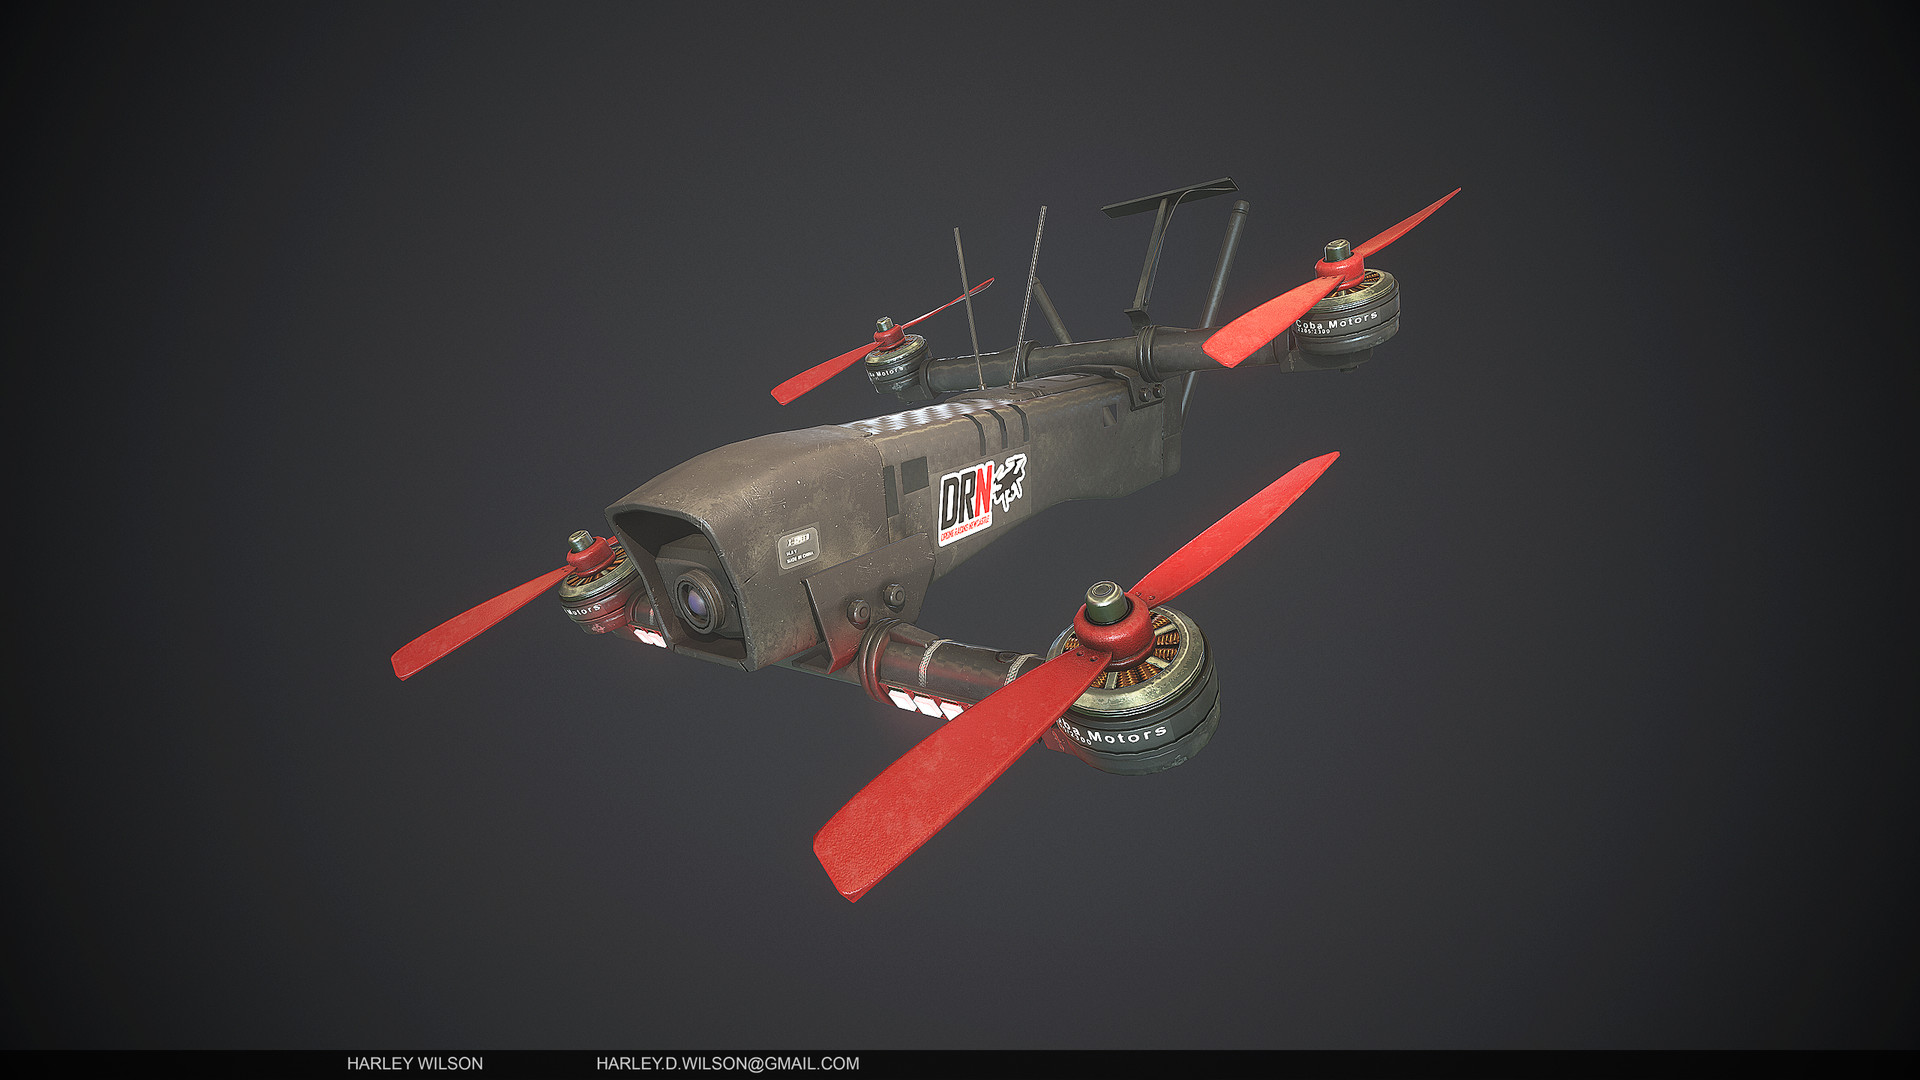 Harley wilson as drone b